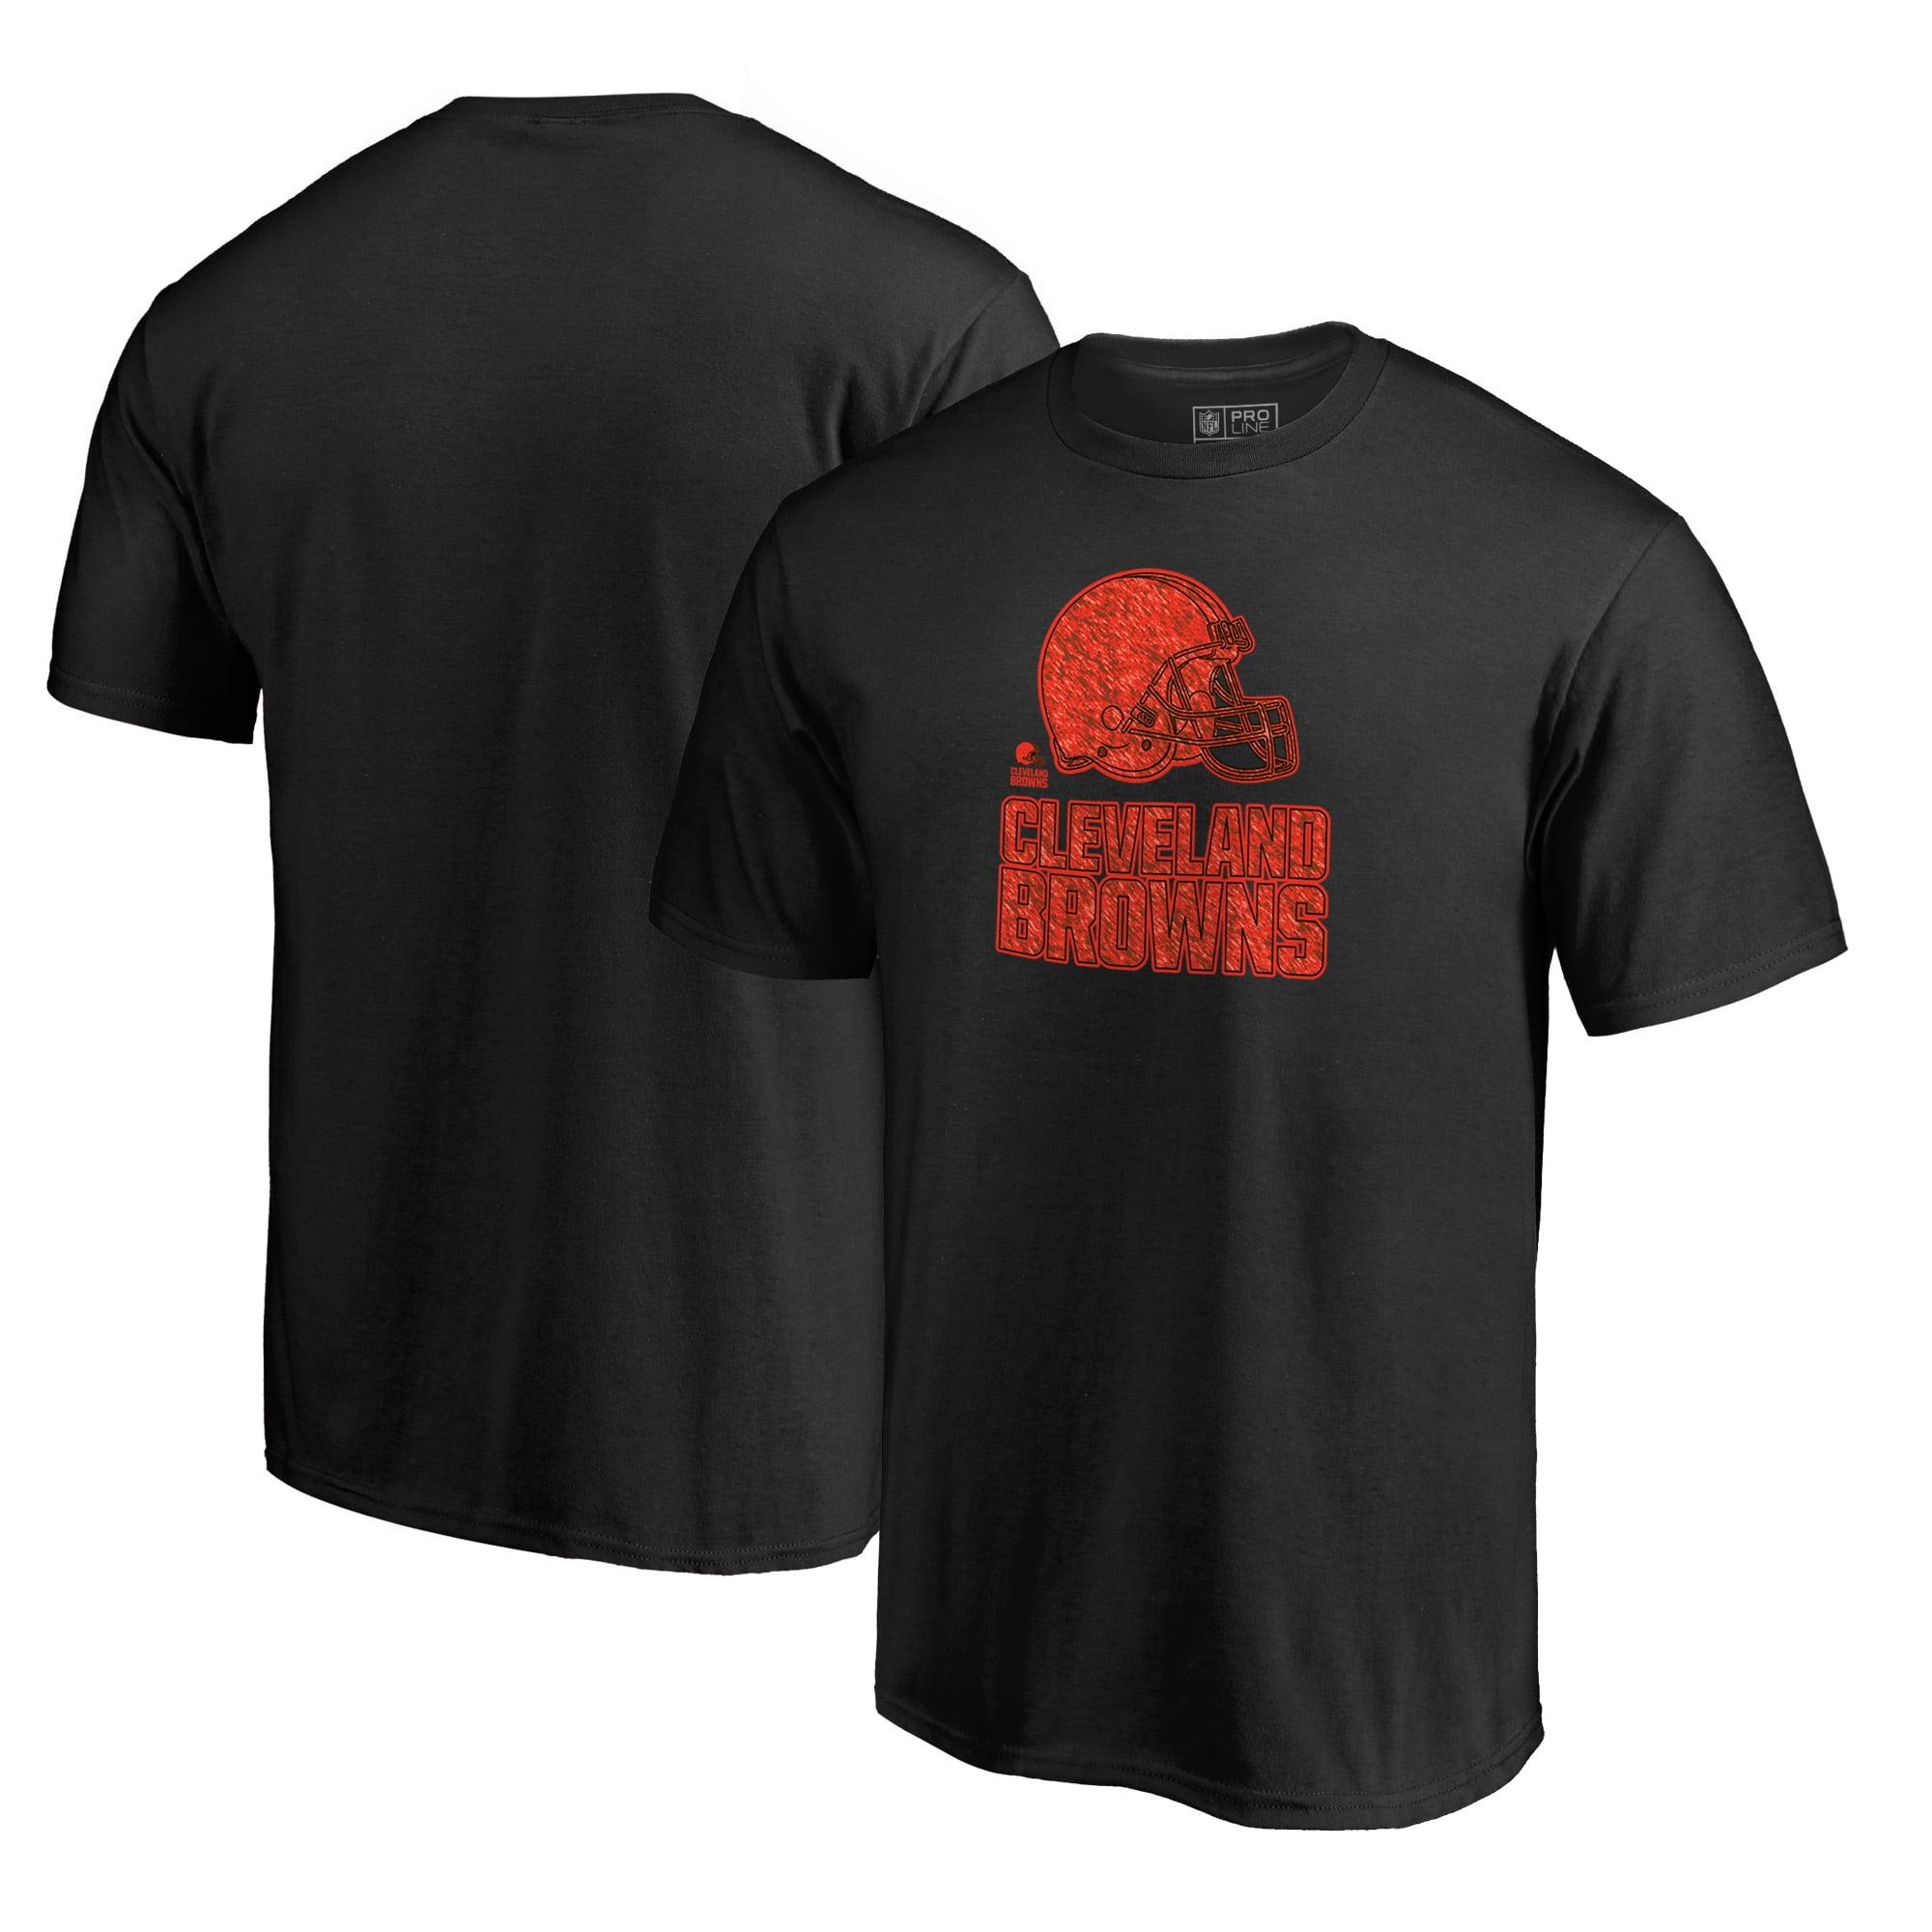 Cleveland Browns NFL Pro Line by Fanatics Branded Training Camp Hookup T-Shirt - Black